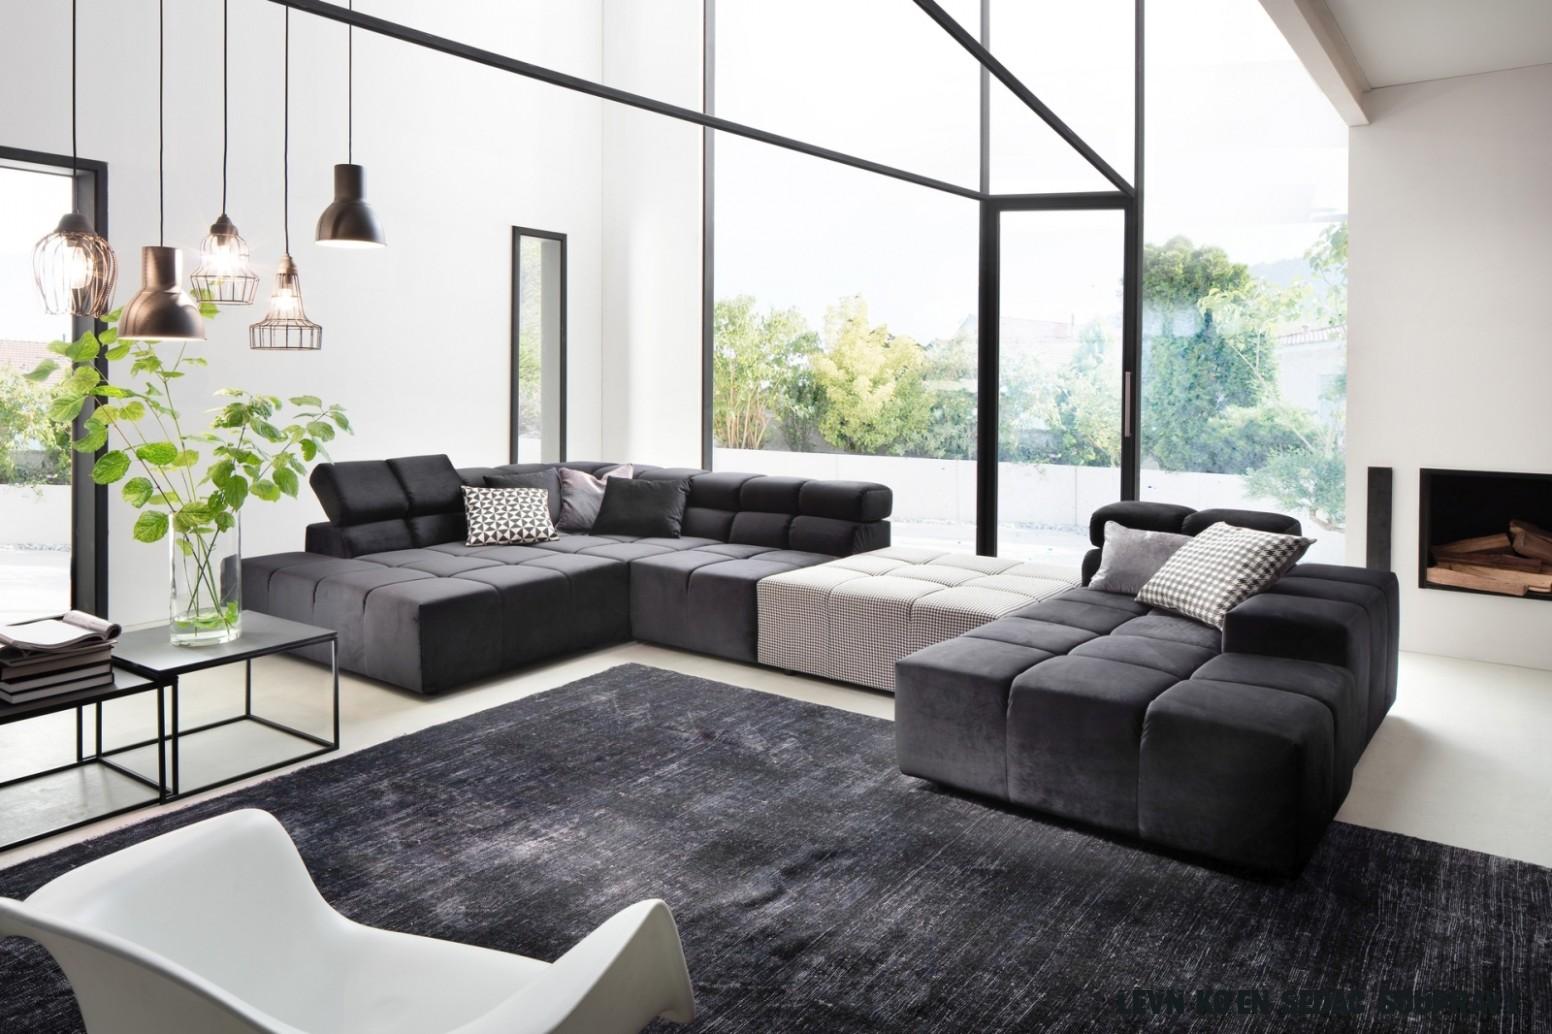 OREGON 18.18 - Moderní nábytek TORRIMEX